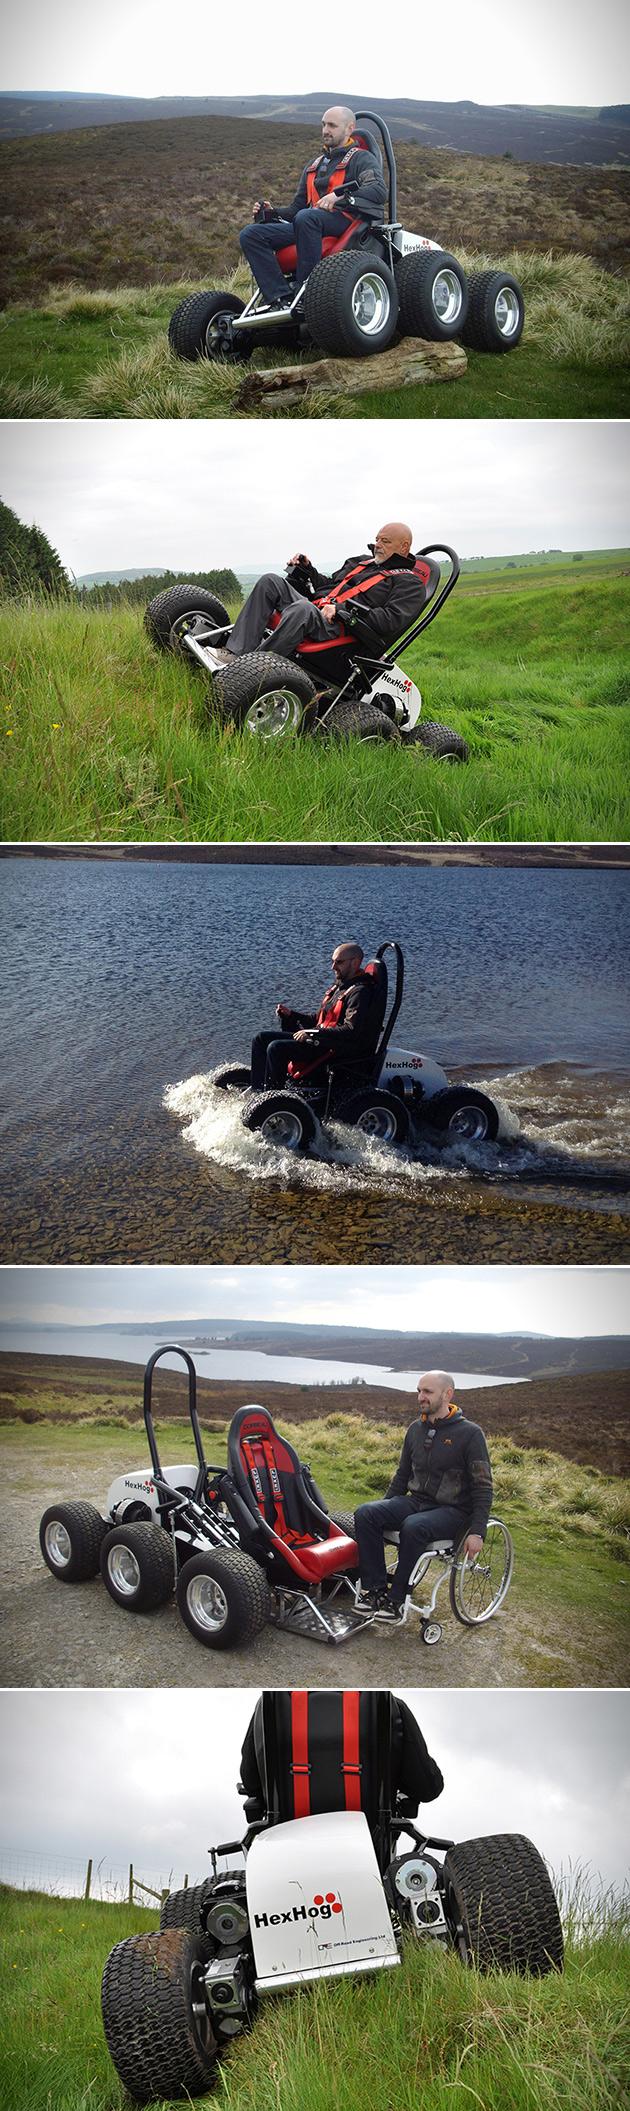 hexhog-off-road-wheelchair